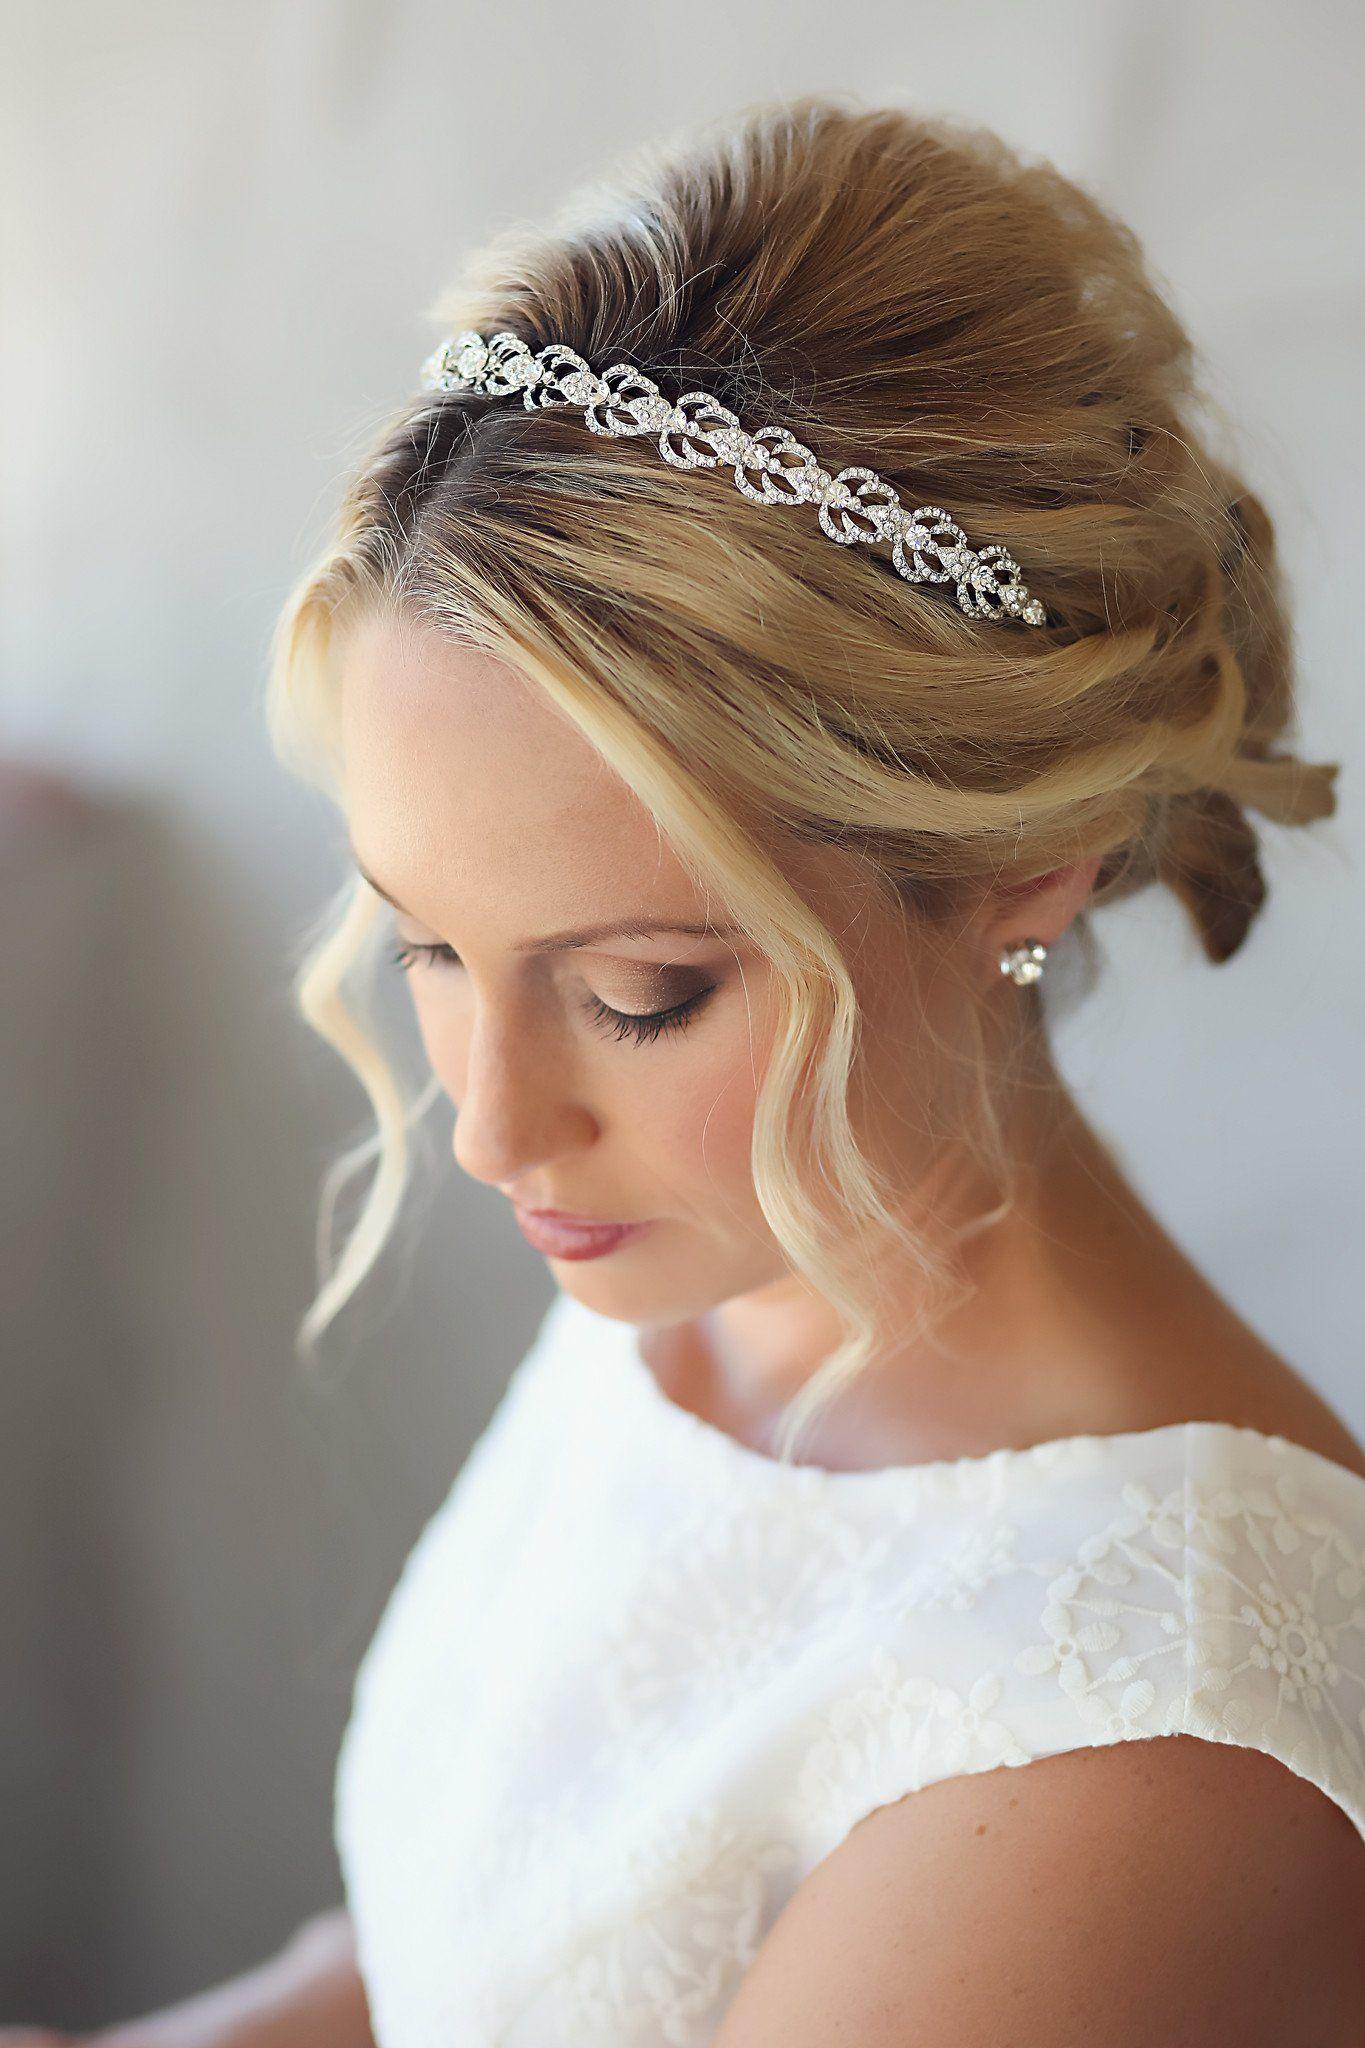 simone headband | wedding veils in 2019 | bridal hair